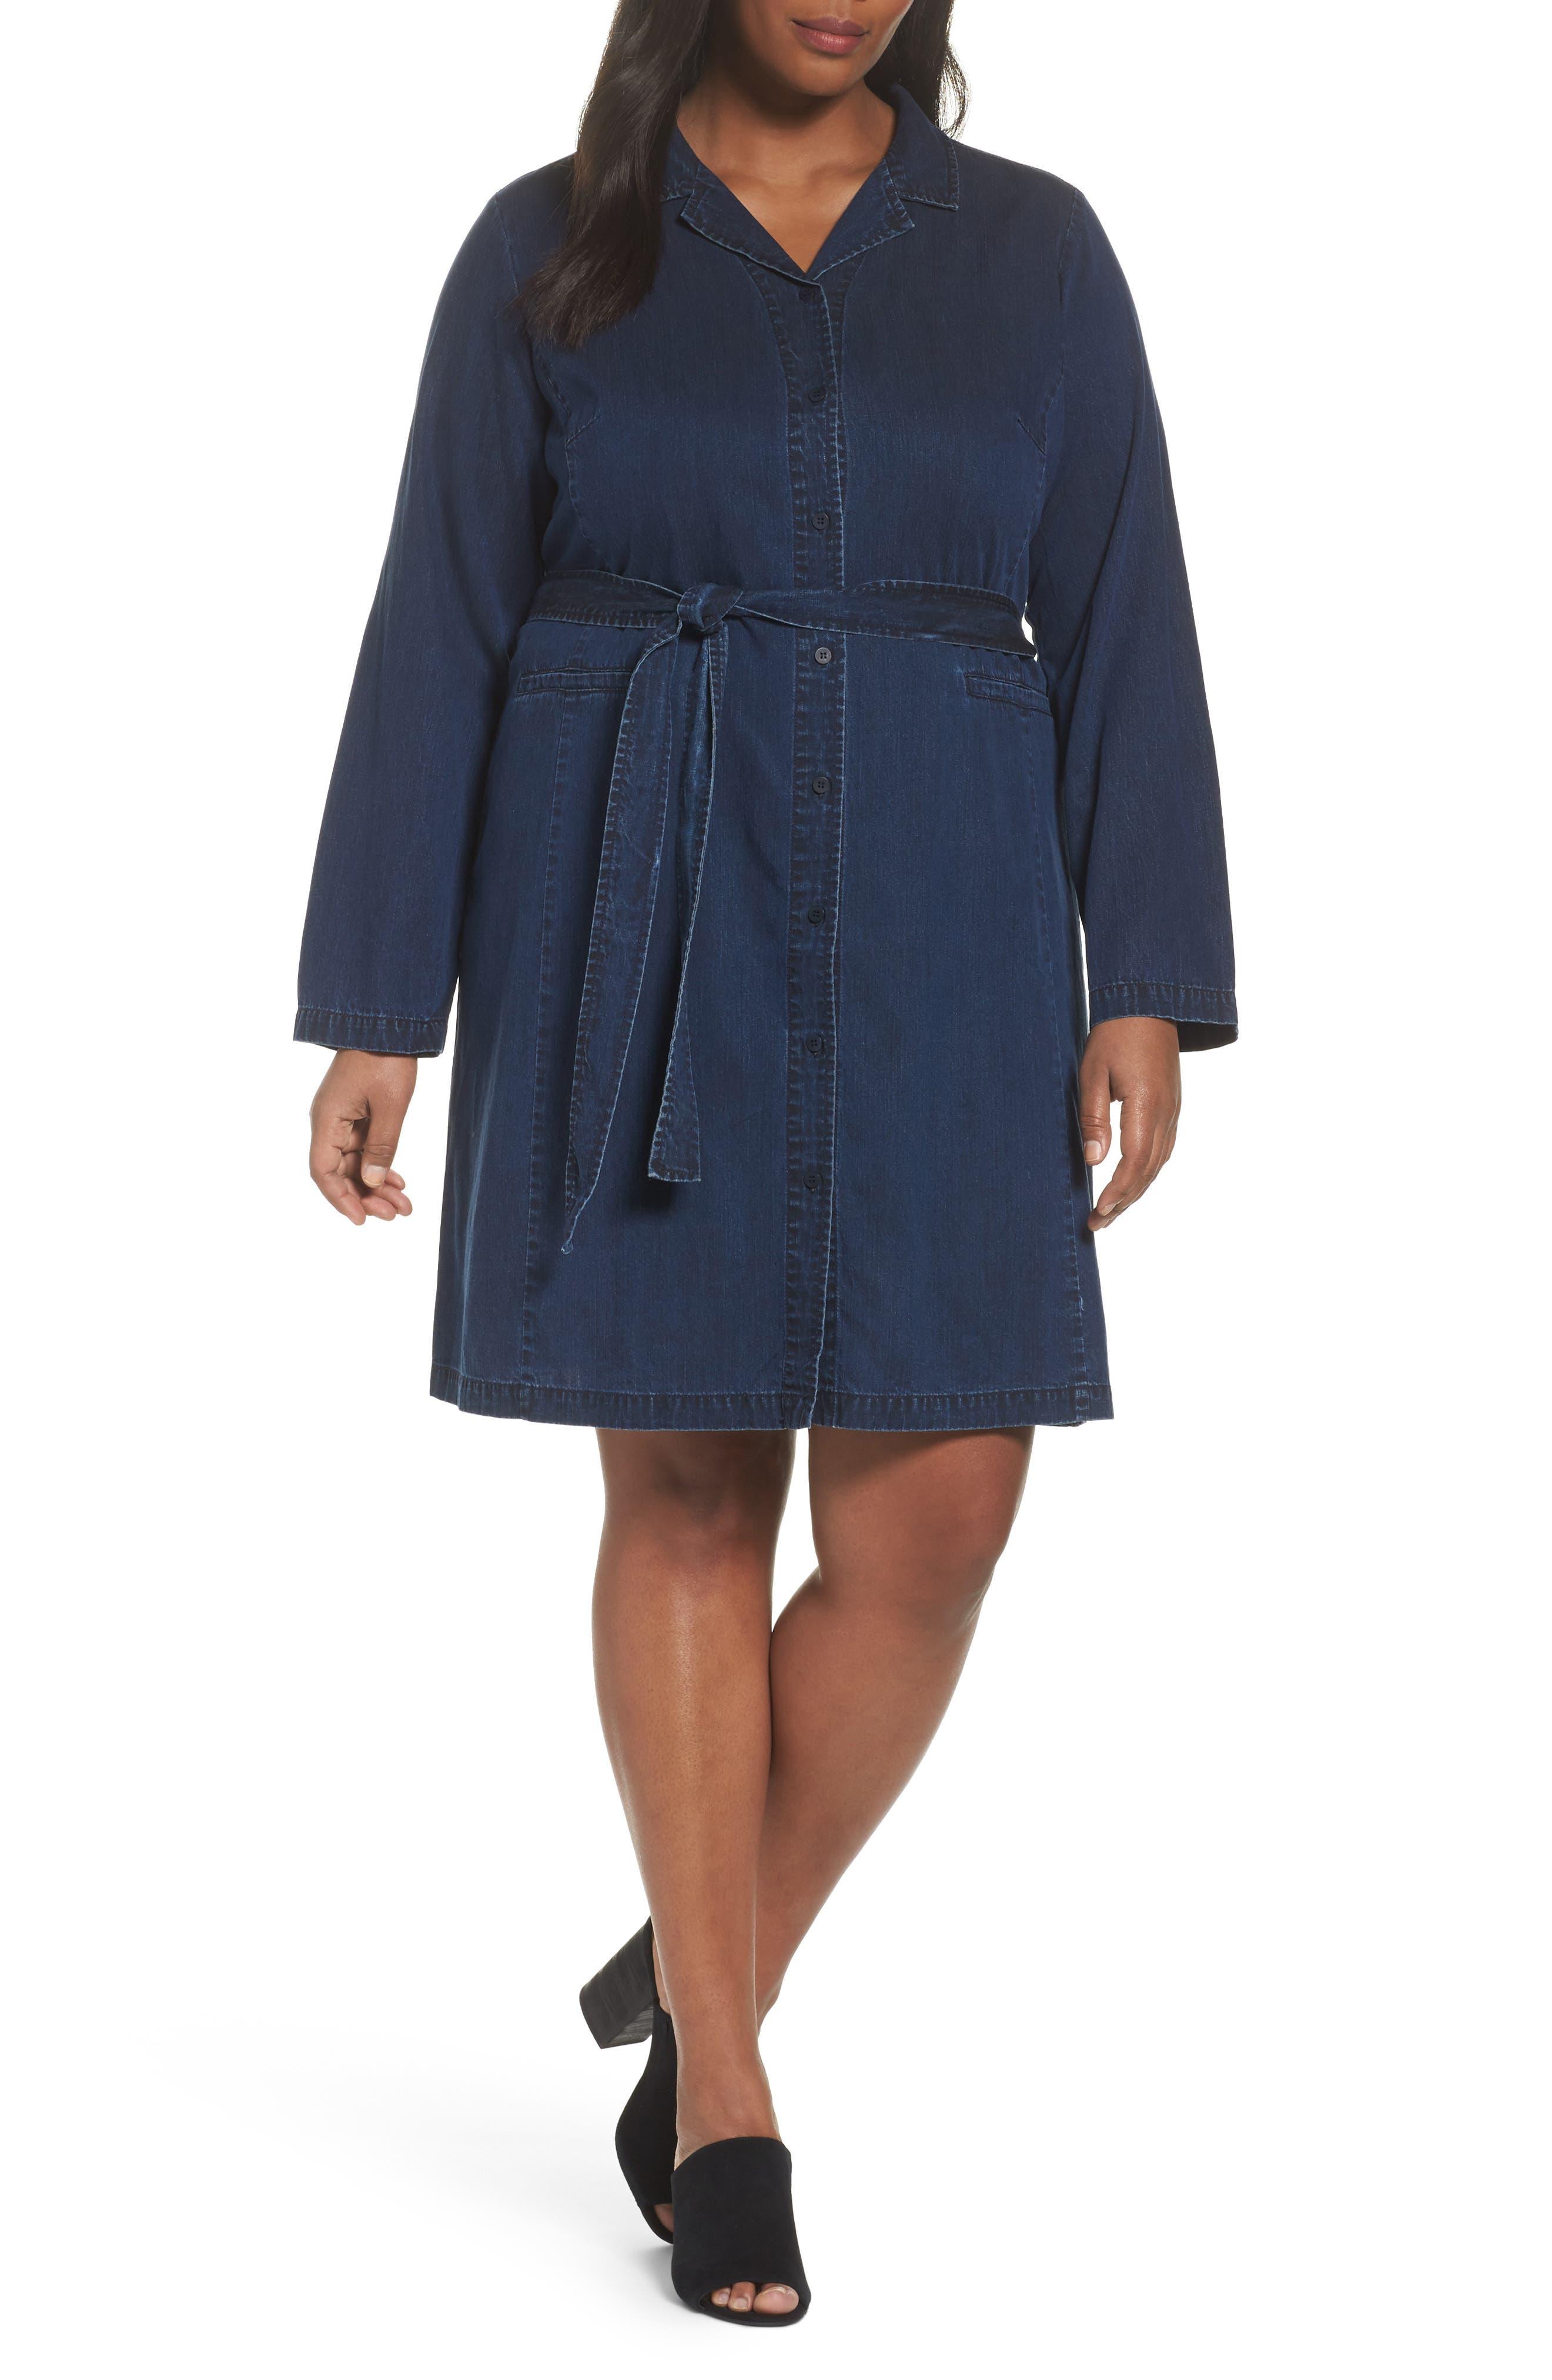 Eileen Fisher Denim Shirtdress (Plus Size)